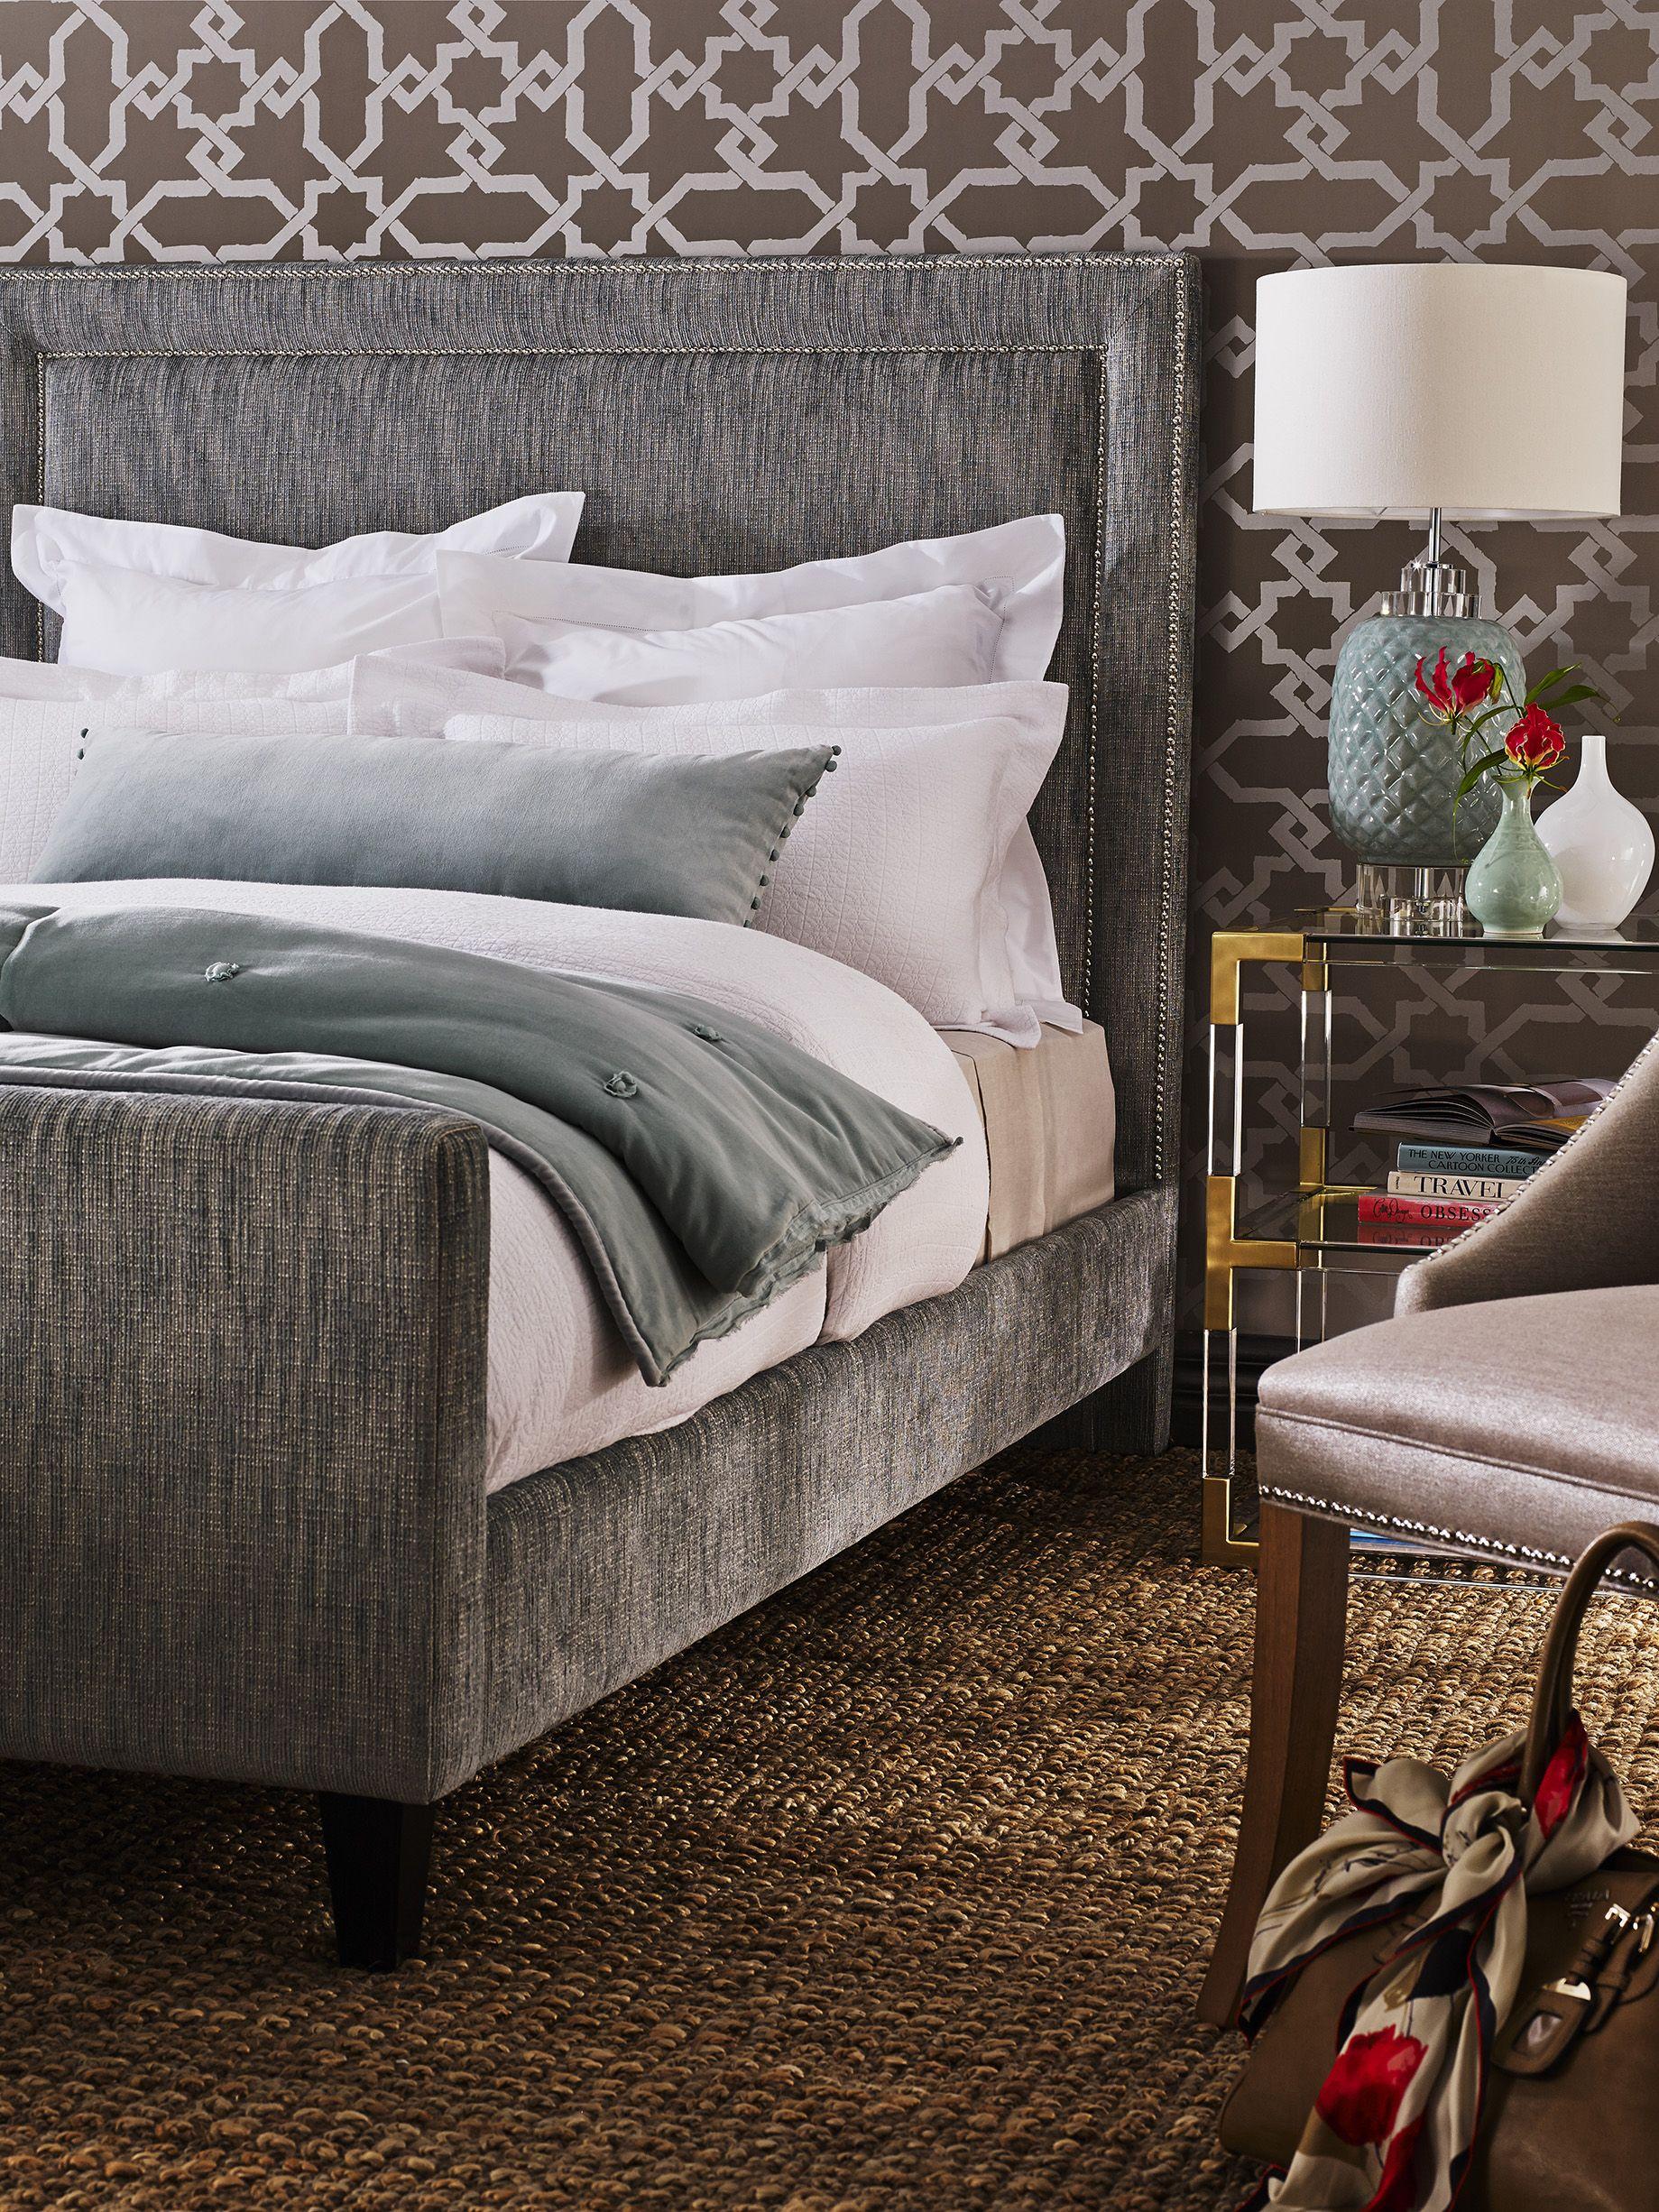 Master bedroom Upholstered bed base with added